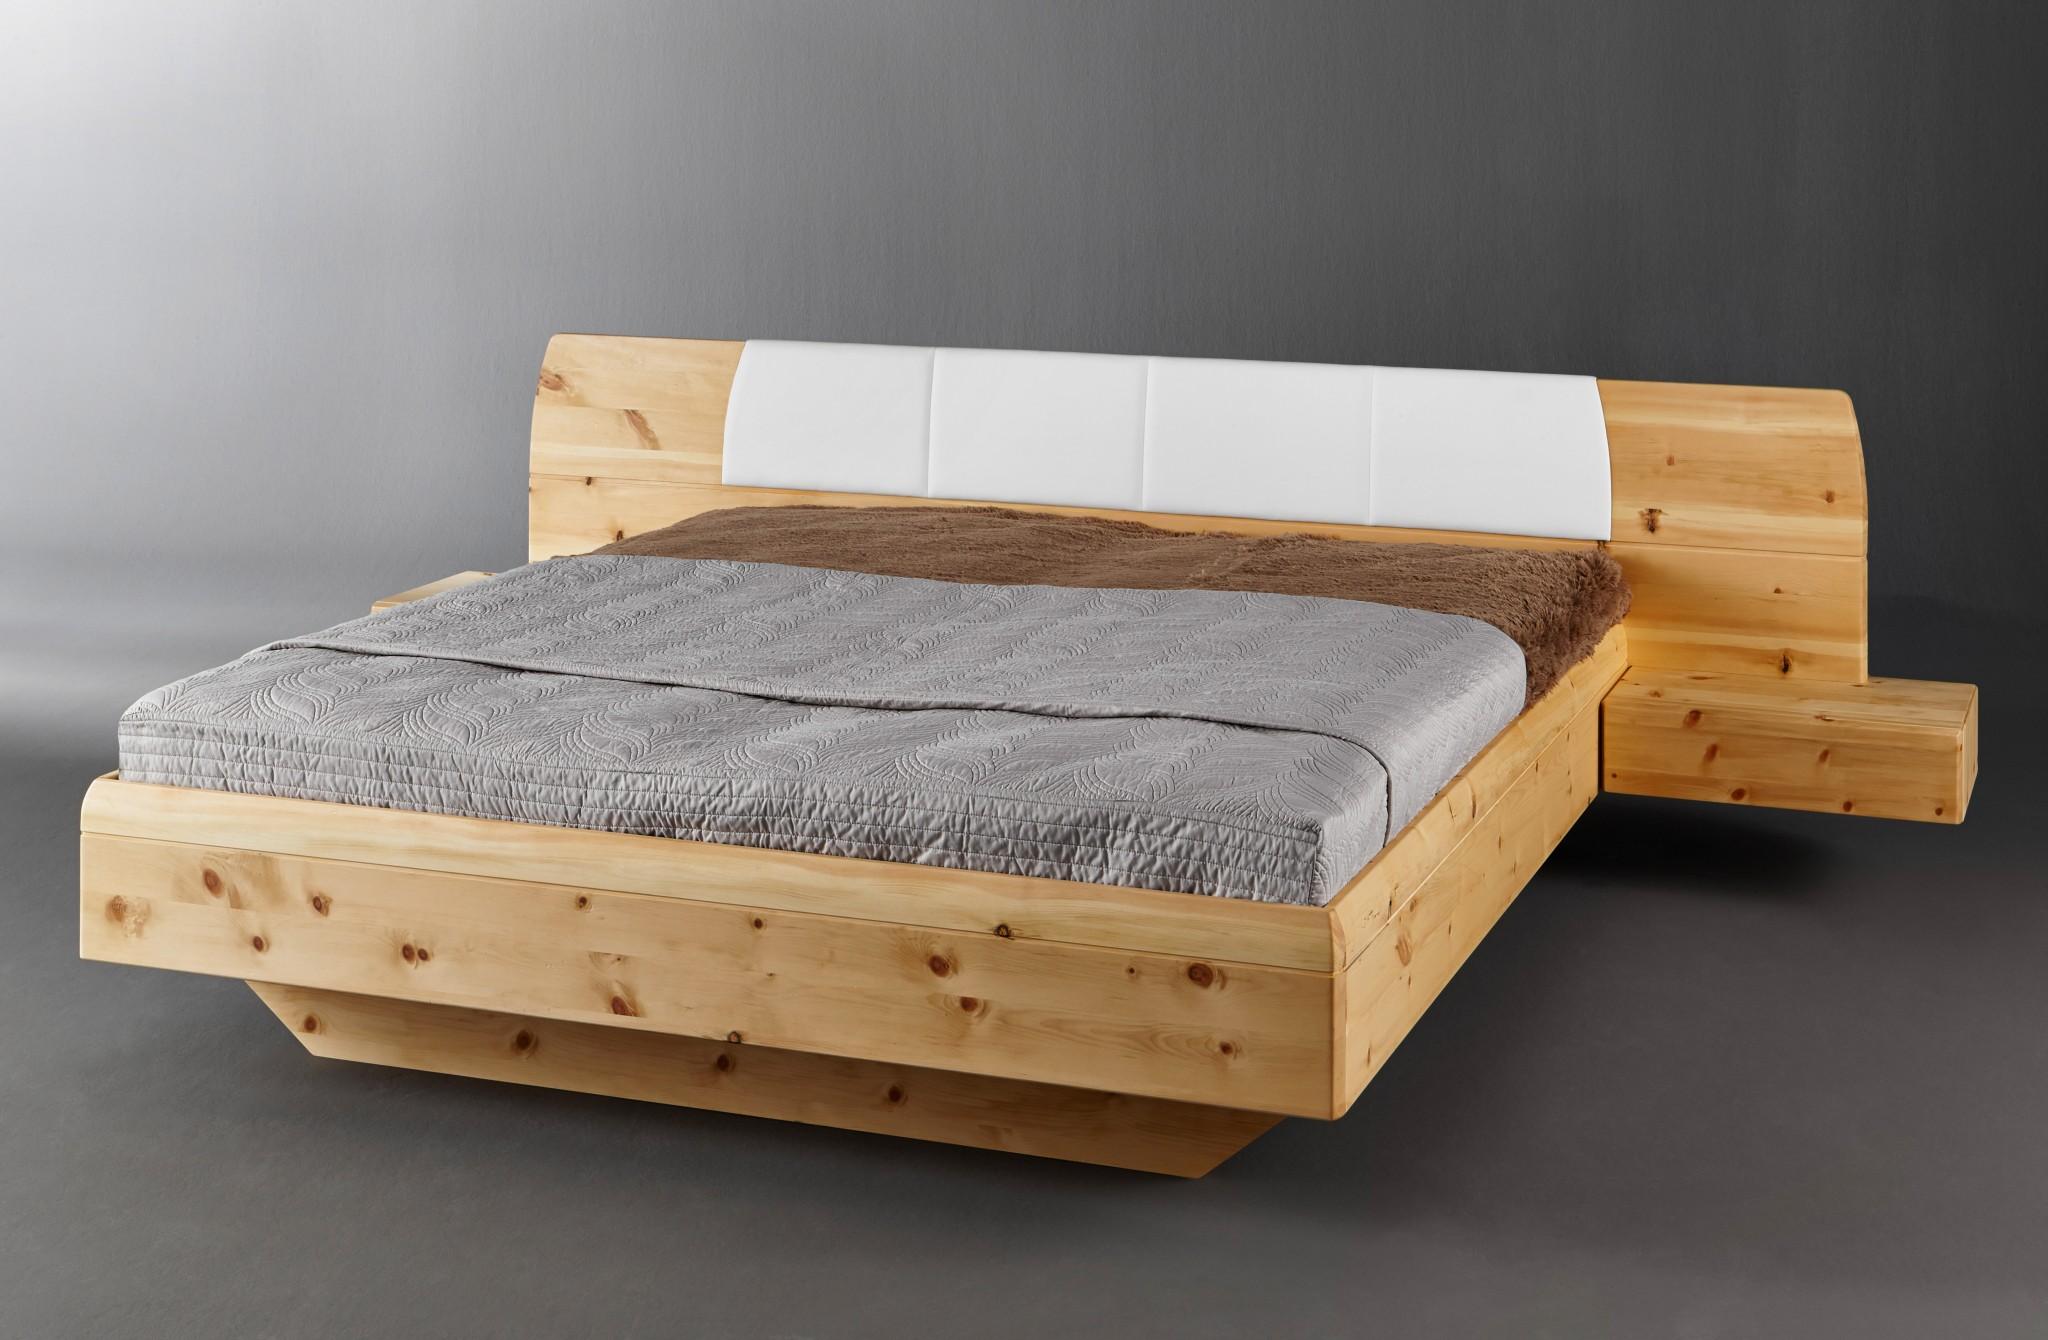 massivholz zirbenbett tares inkl 2 nachtk228stchen in